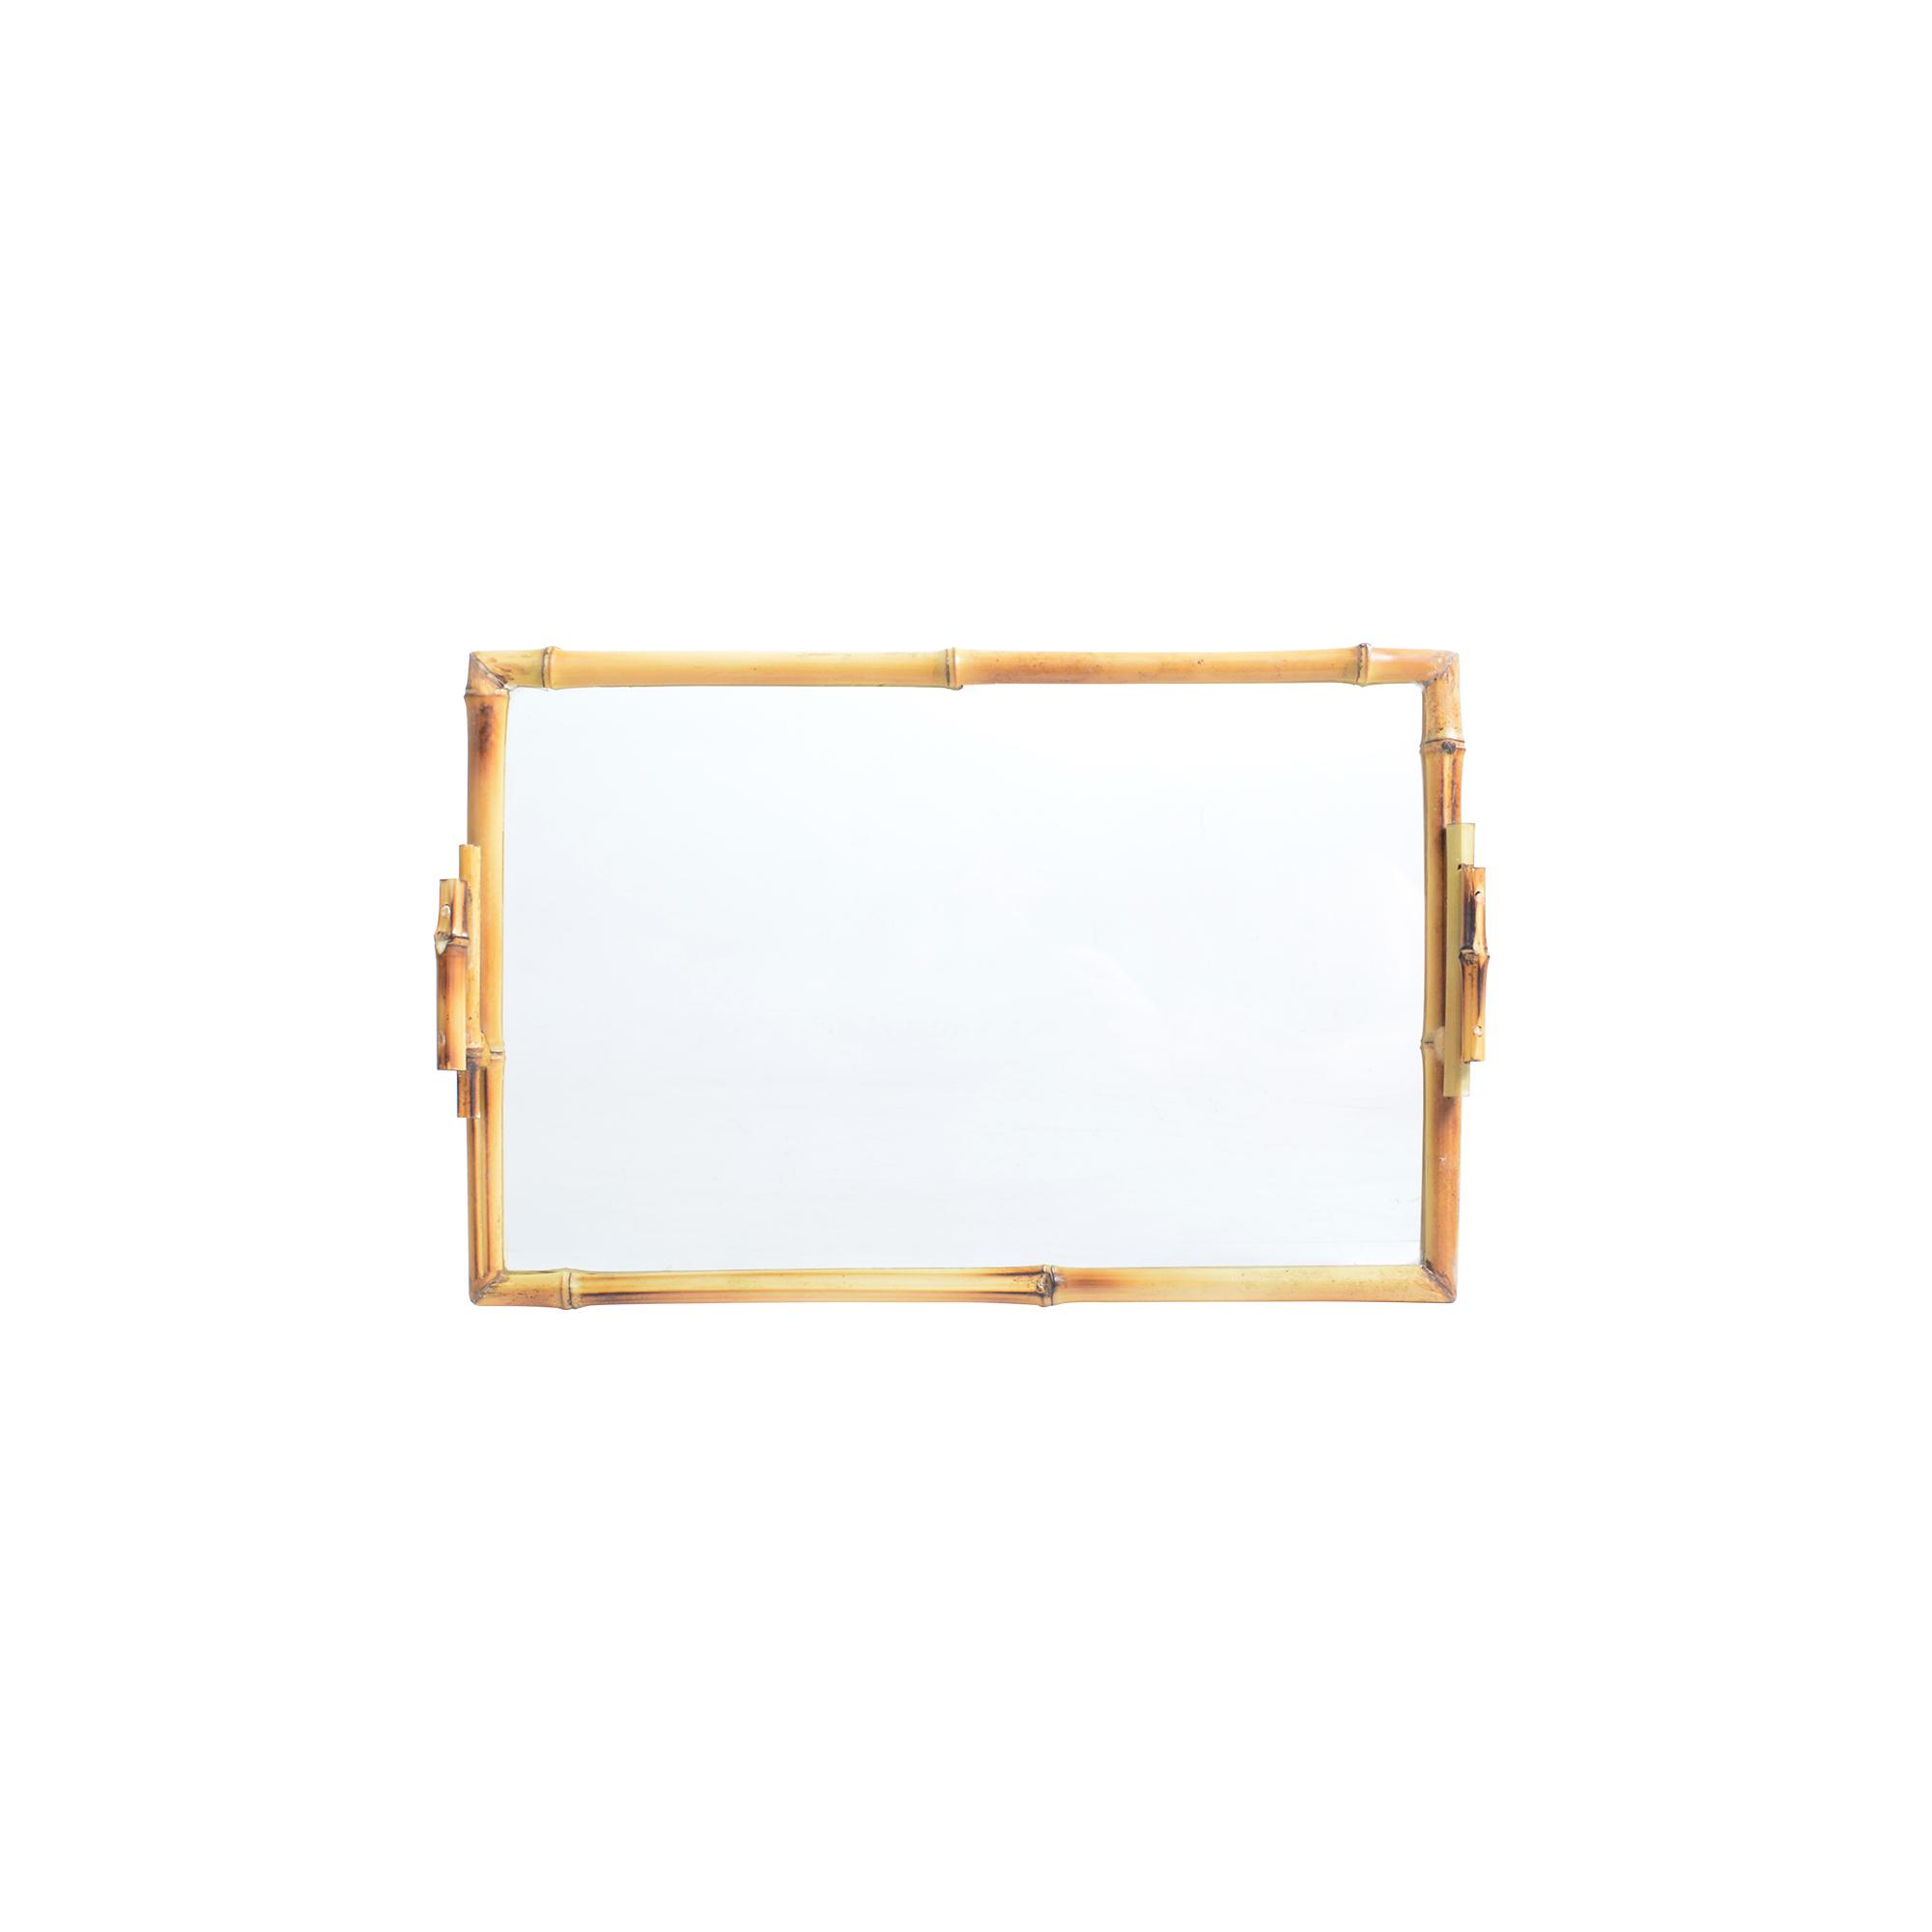 Bandeja de bambu com vidro retangular M lisa